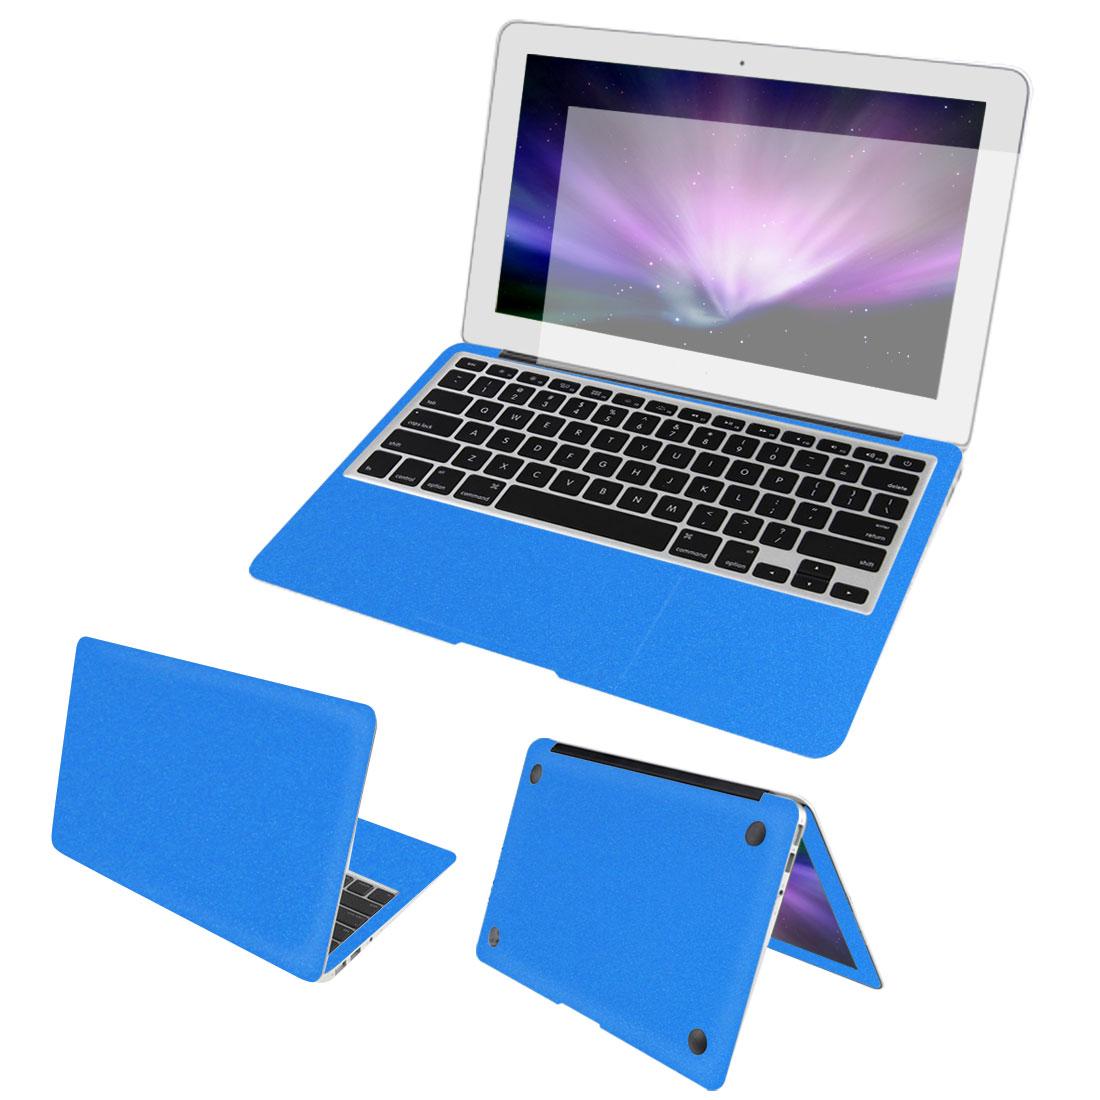 "Blue Full Body Wrap Protector Decal Skin Cover Screen Film for Macbook Air 13"""